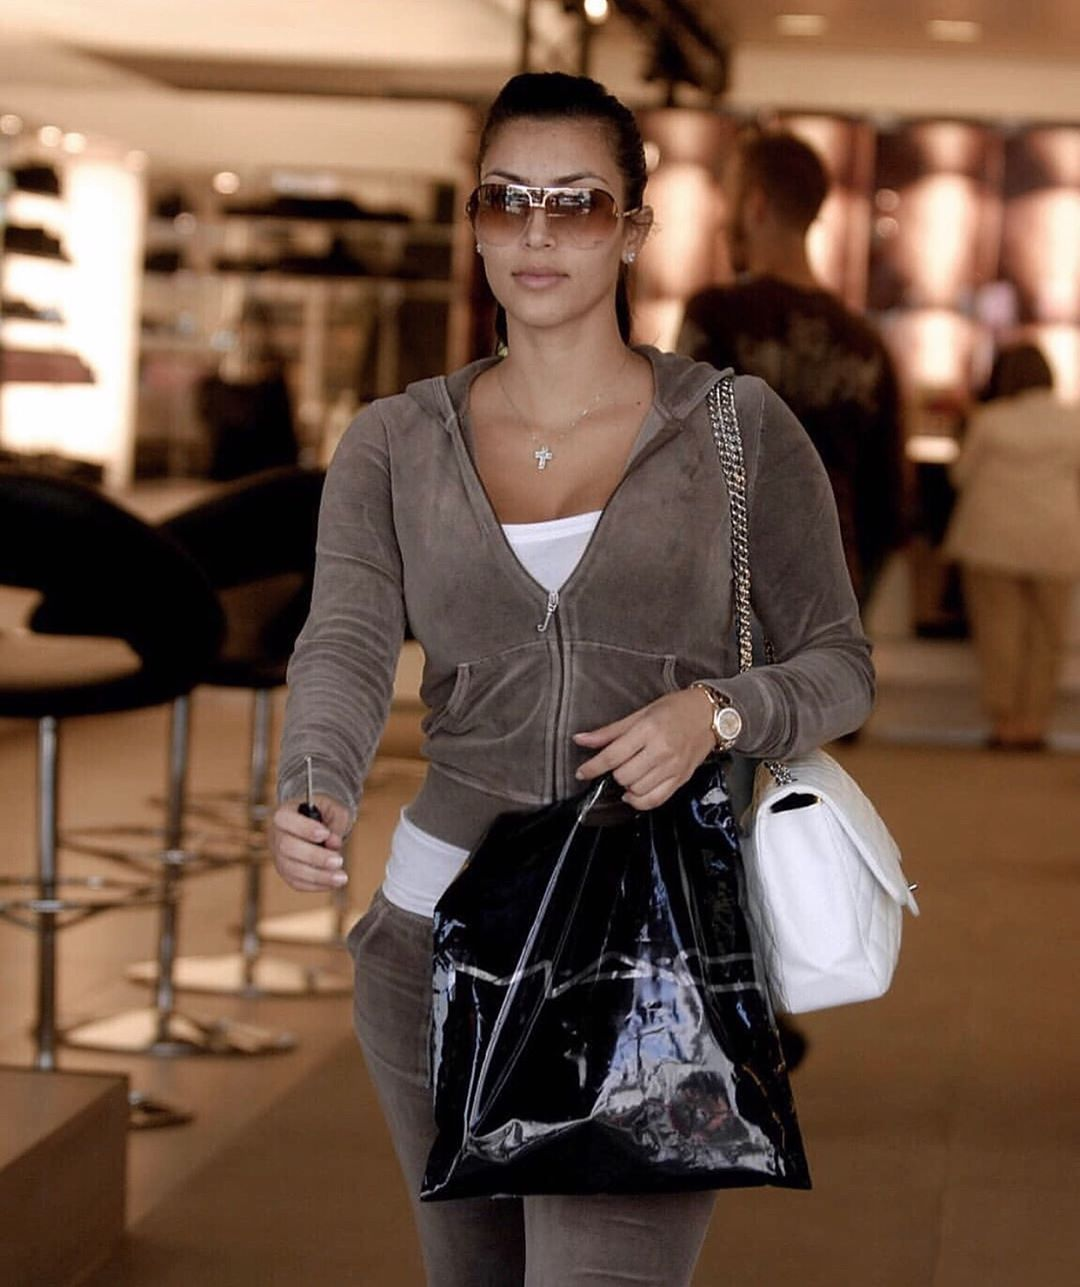 crucifixo de kim kardashian 2007